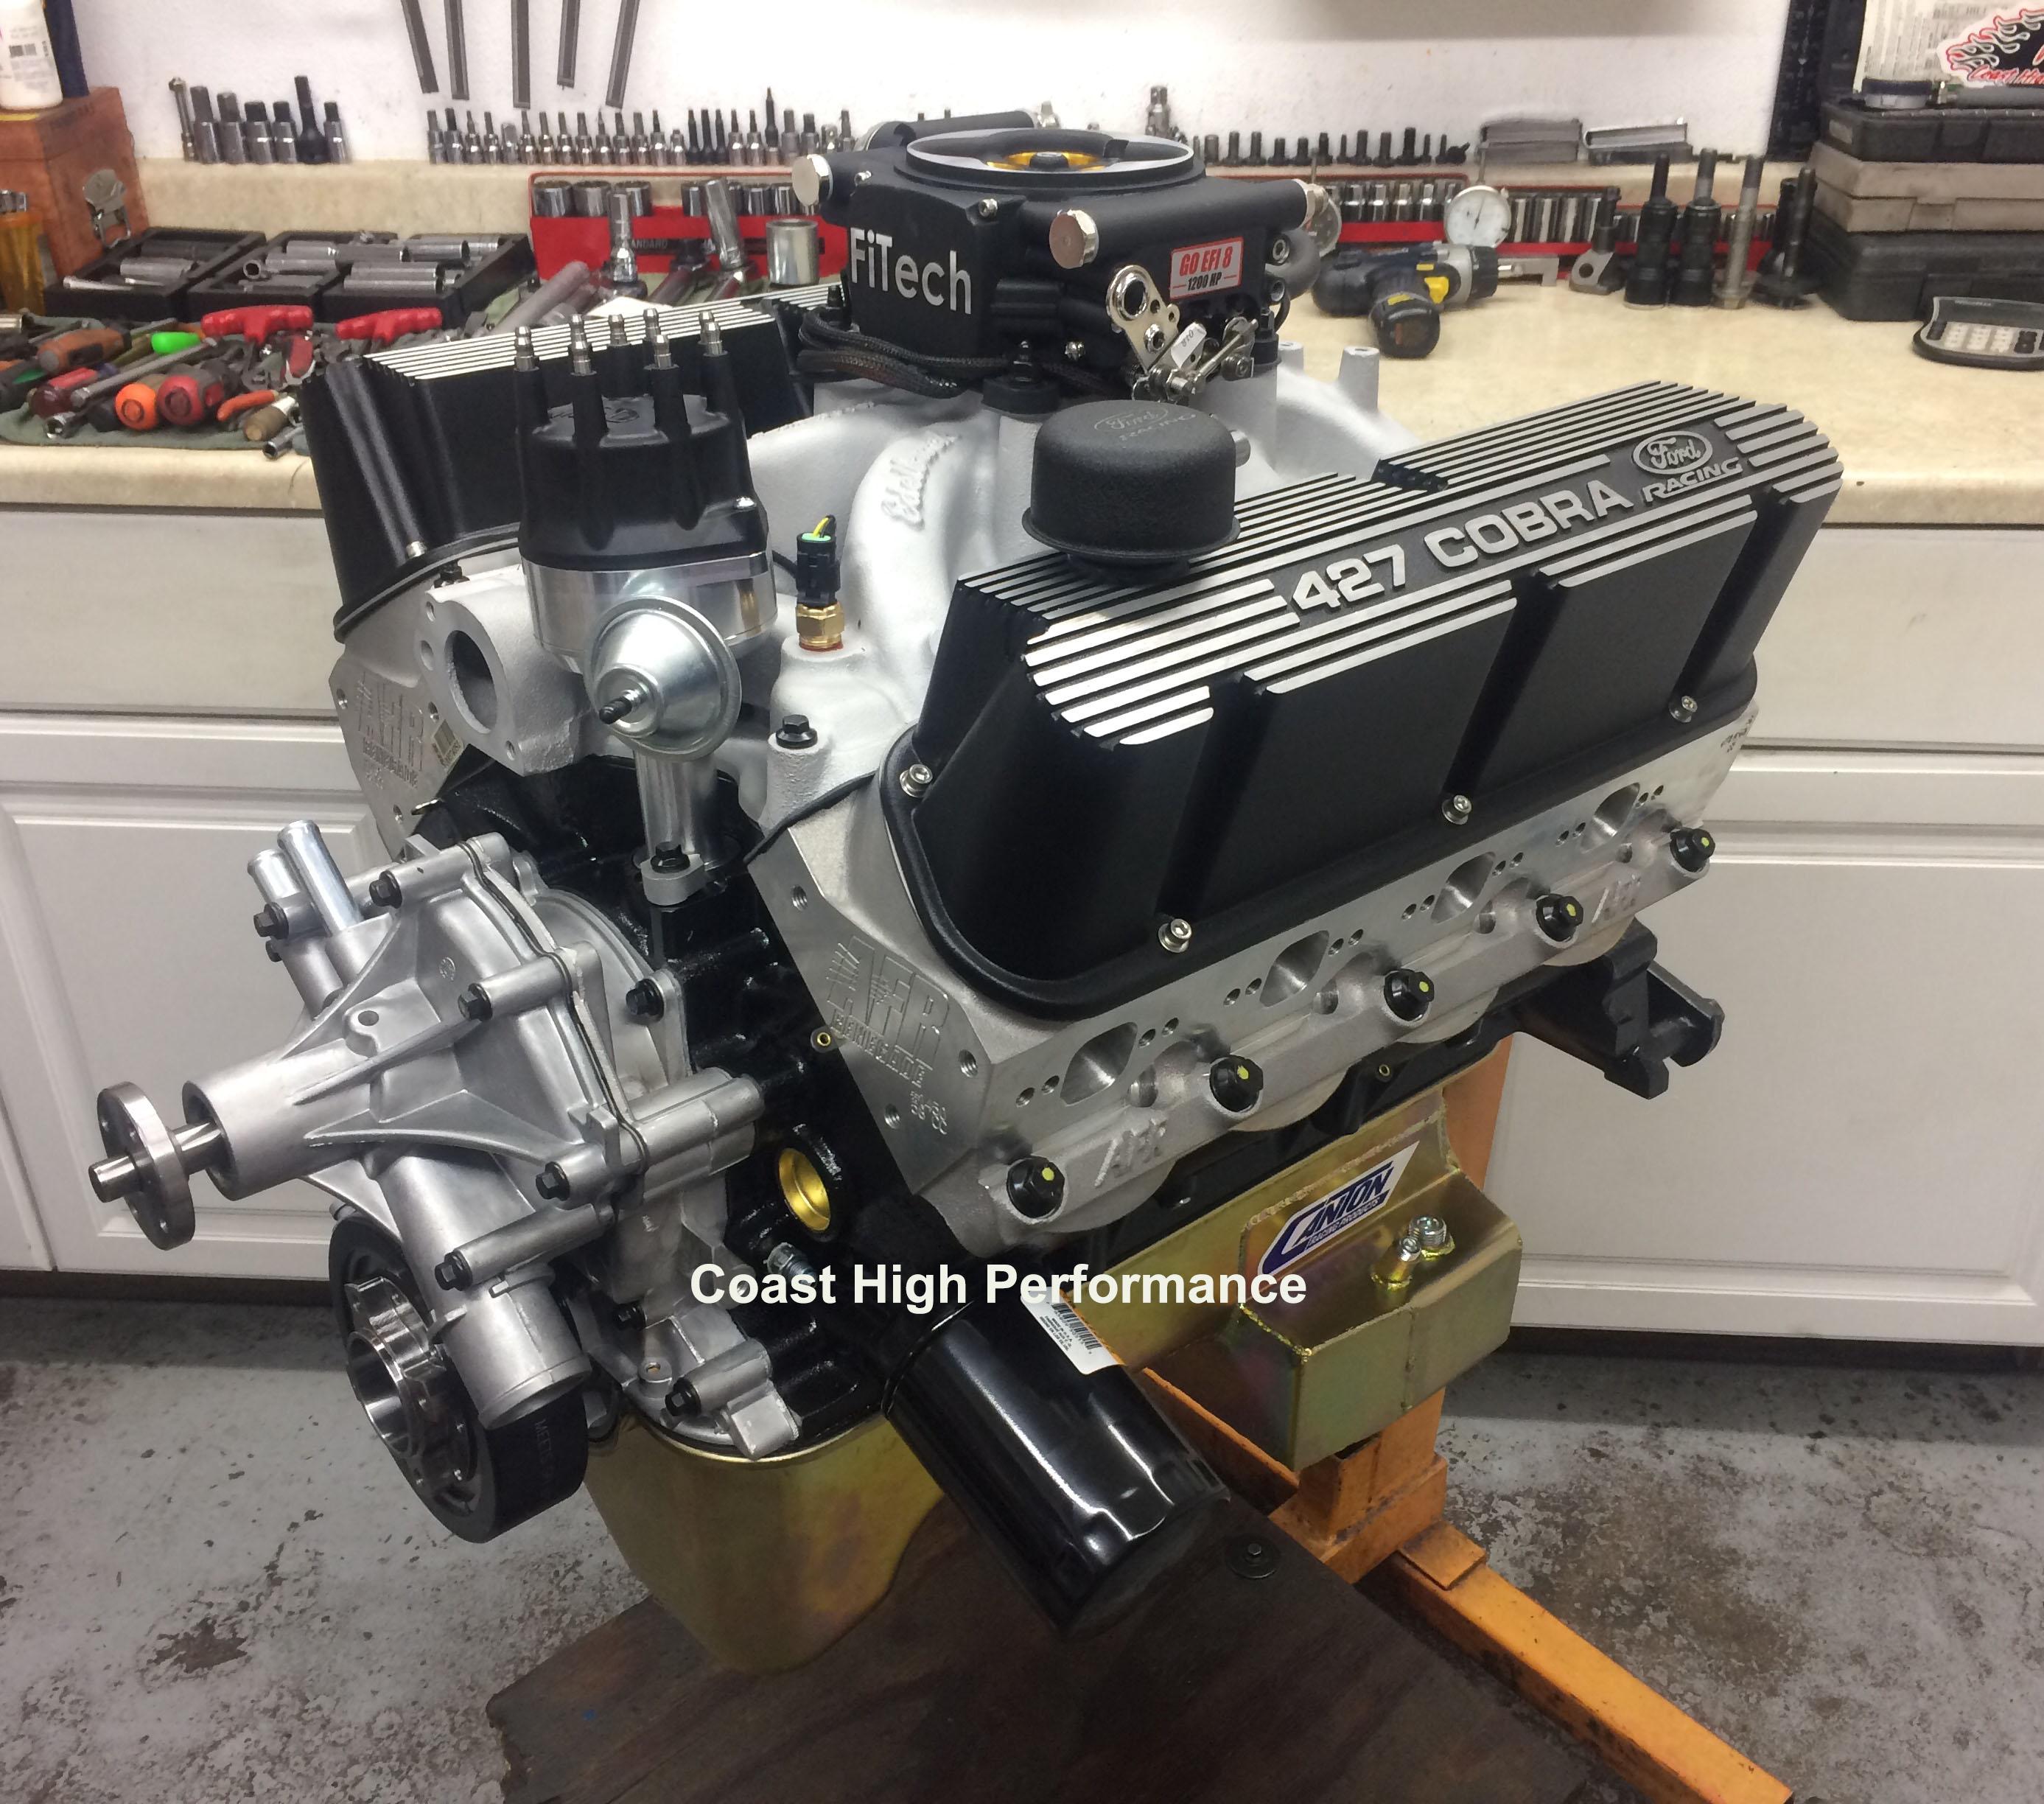 Big Block Chevy Blower Pistons: High Performance Horsepower